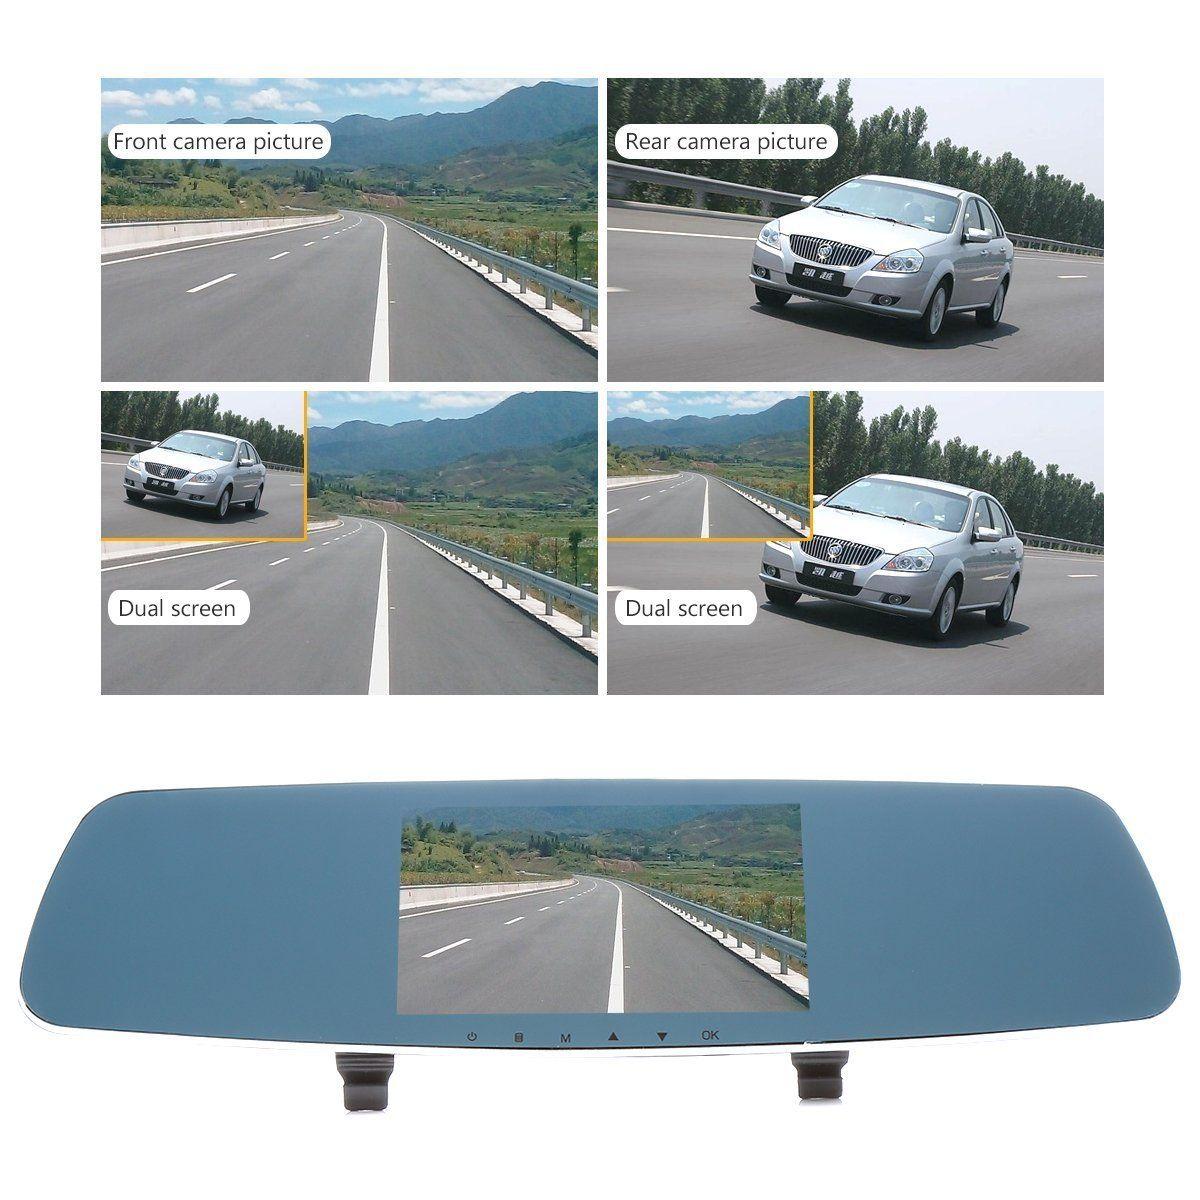 FHD Dual Screen Rearview Mirror Car DVR Recorder Dash Camera IR Night Vision Abilities Loop Recording G Sensor Motion Detection PZ909A